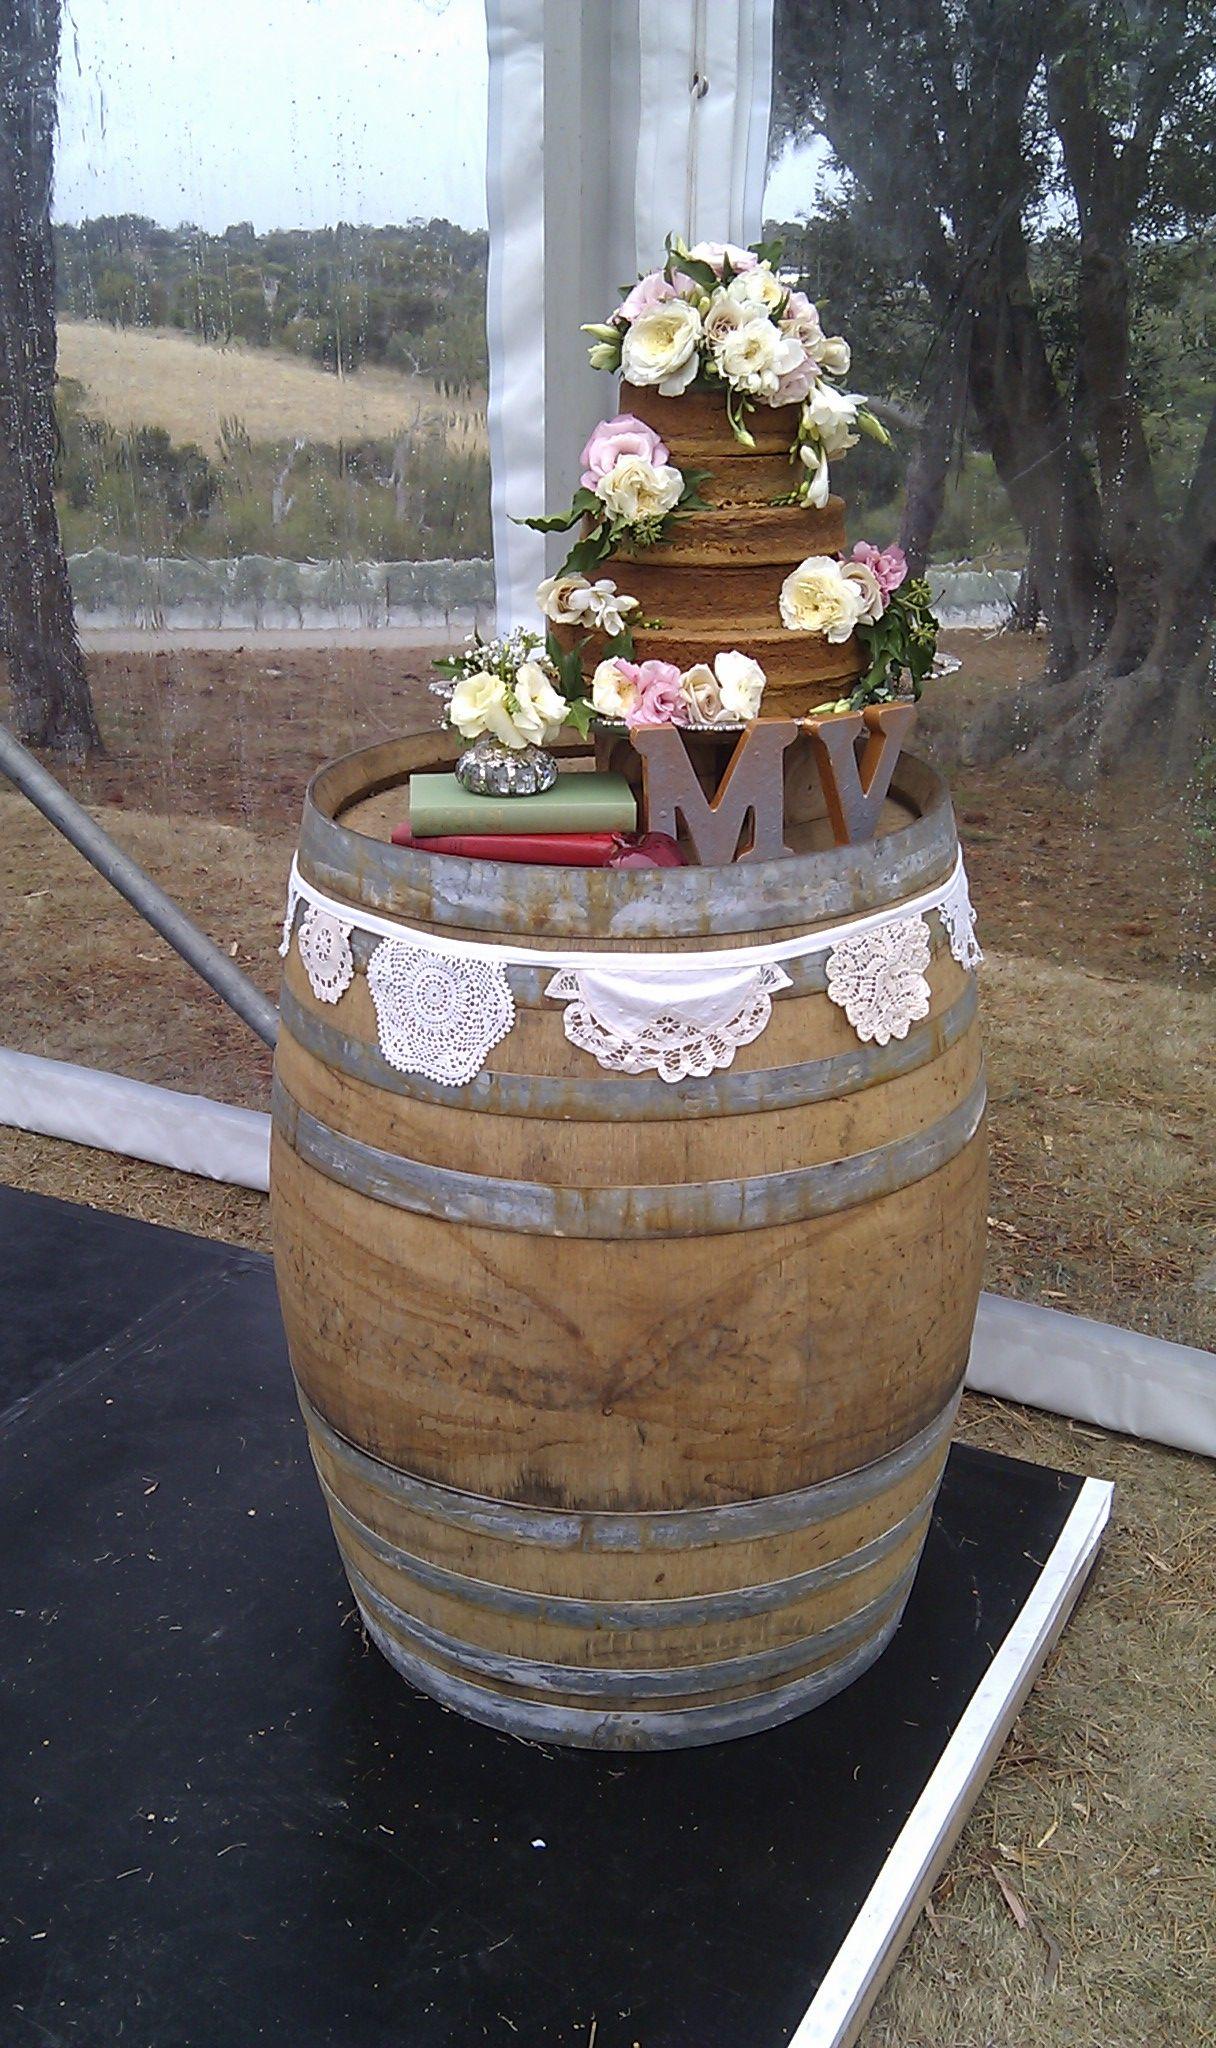 The Wedding Cake Stand - Wine Barrel - Traditional Sri Lankan Love Cake